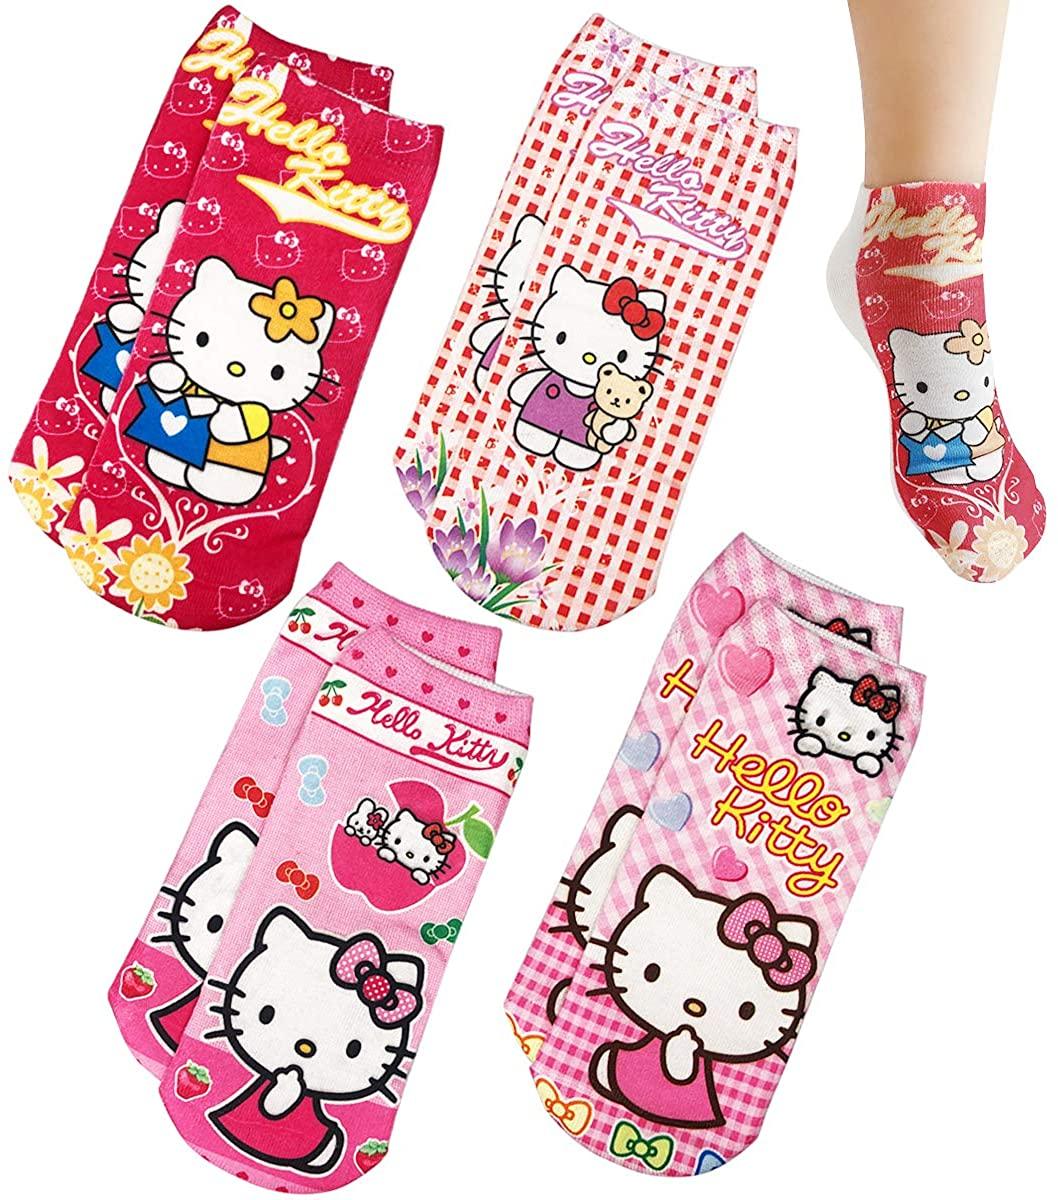 Surmoler Toddler Girls Cartoon Socks, 3-7 year old Baby Kids Animation Skid Soles Socks -Pink Pig